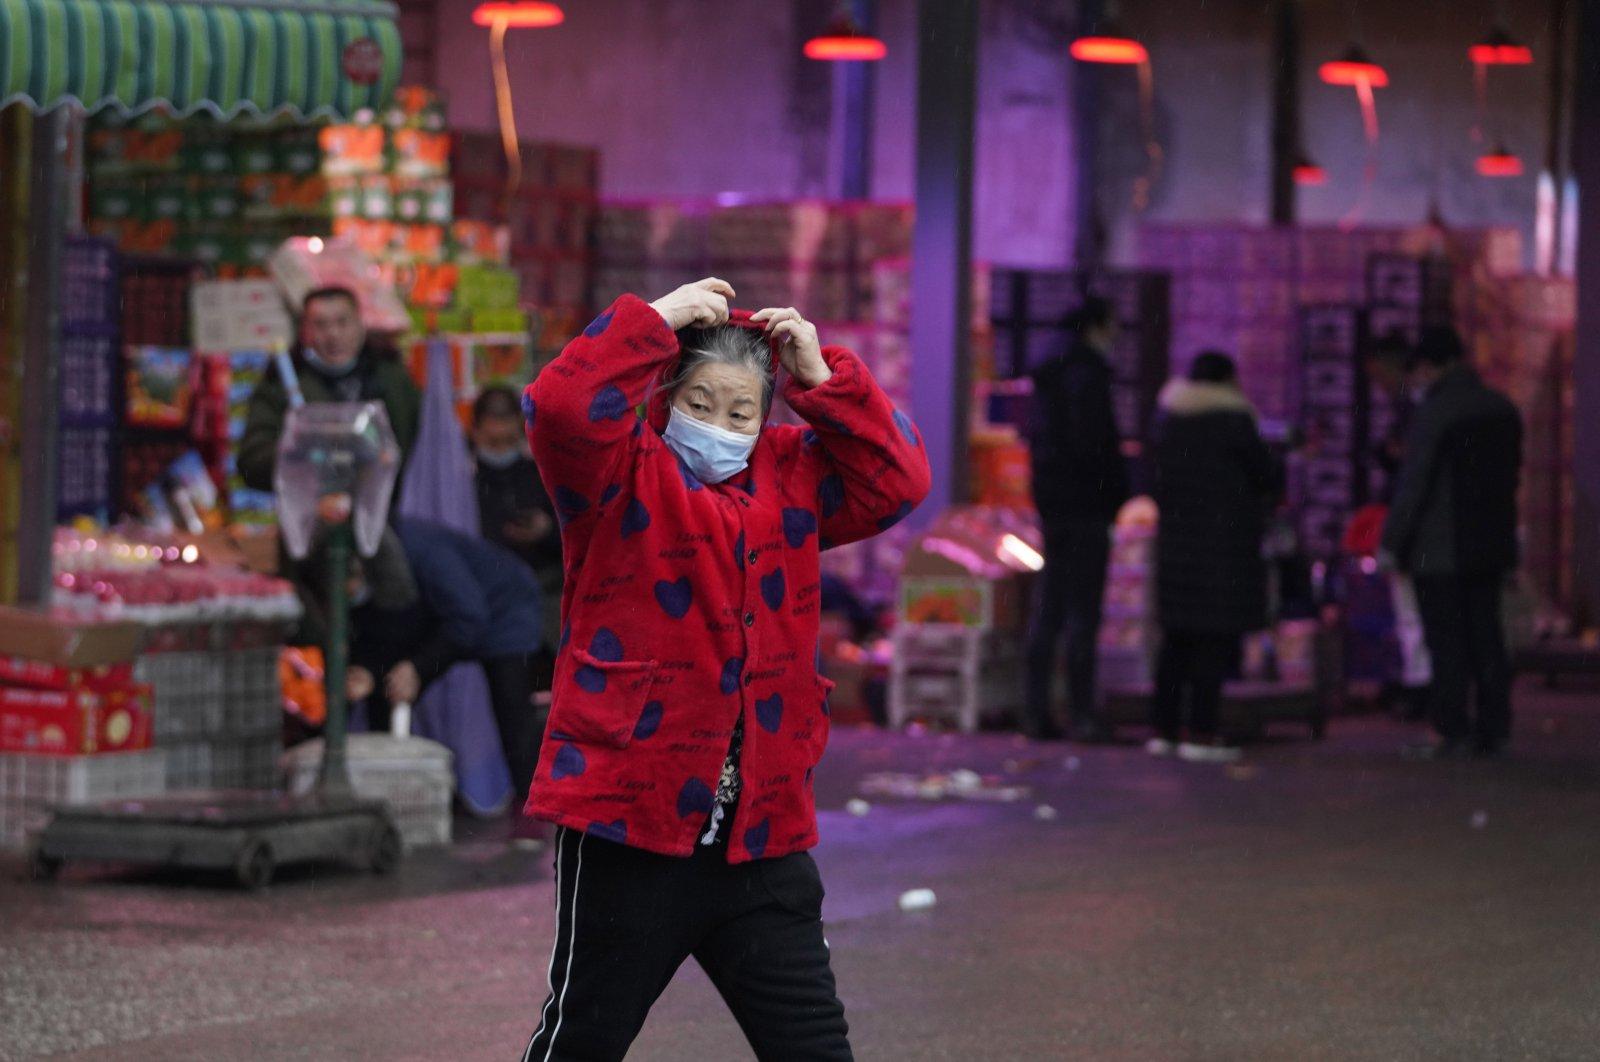 A woman wearing her mask walks past a fruit market near the Huanan Seafood Market in Wuhan, China, Jan. 31, 2021. (AP Photo)